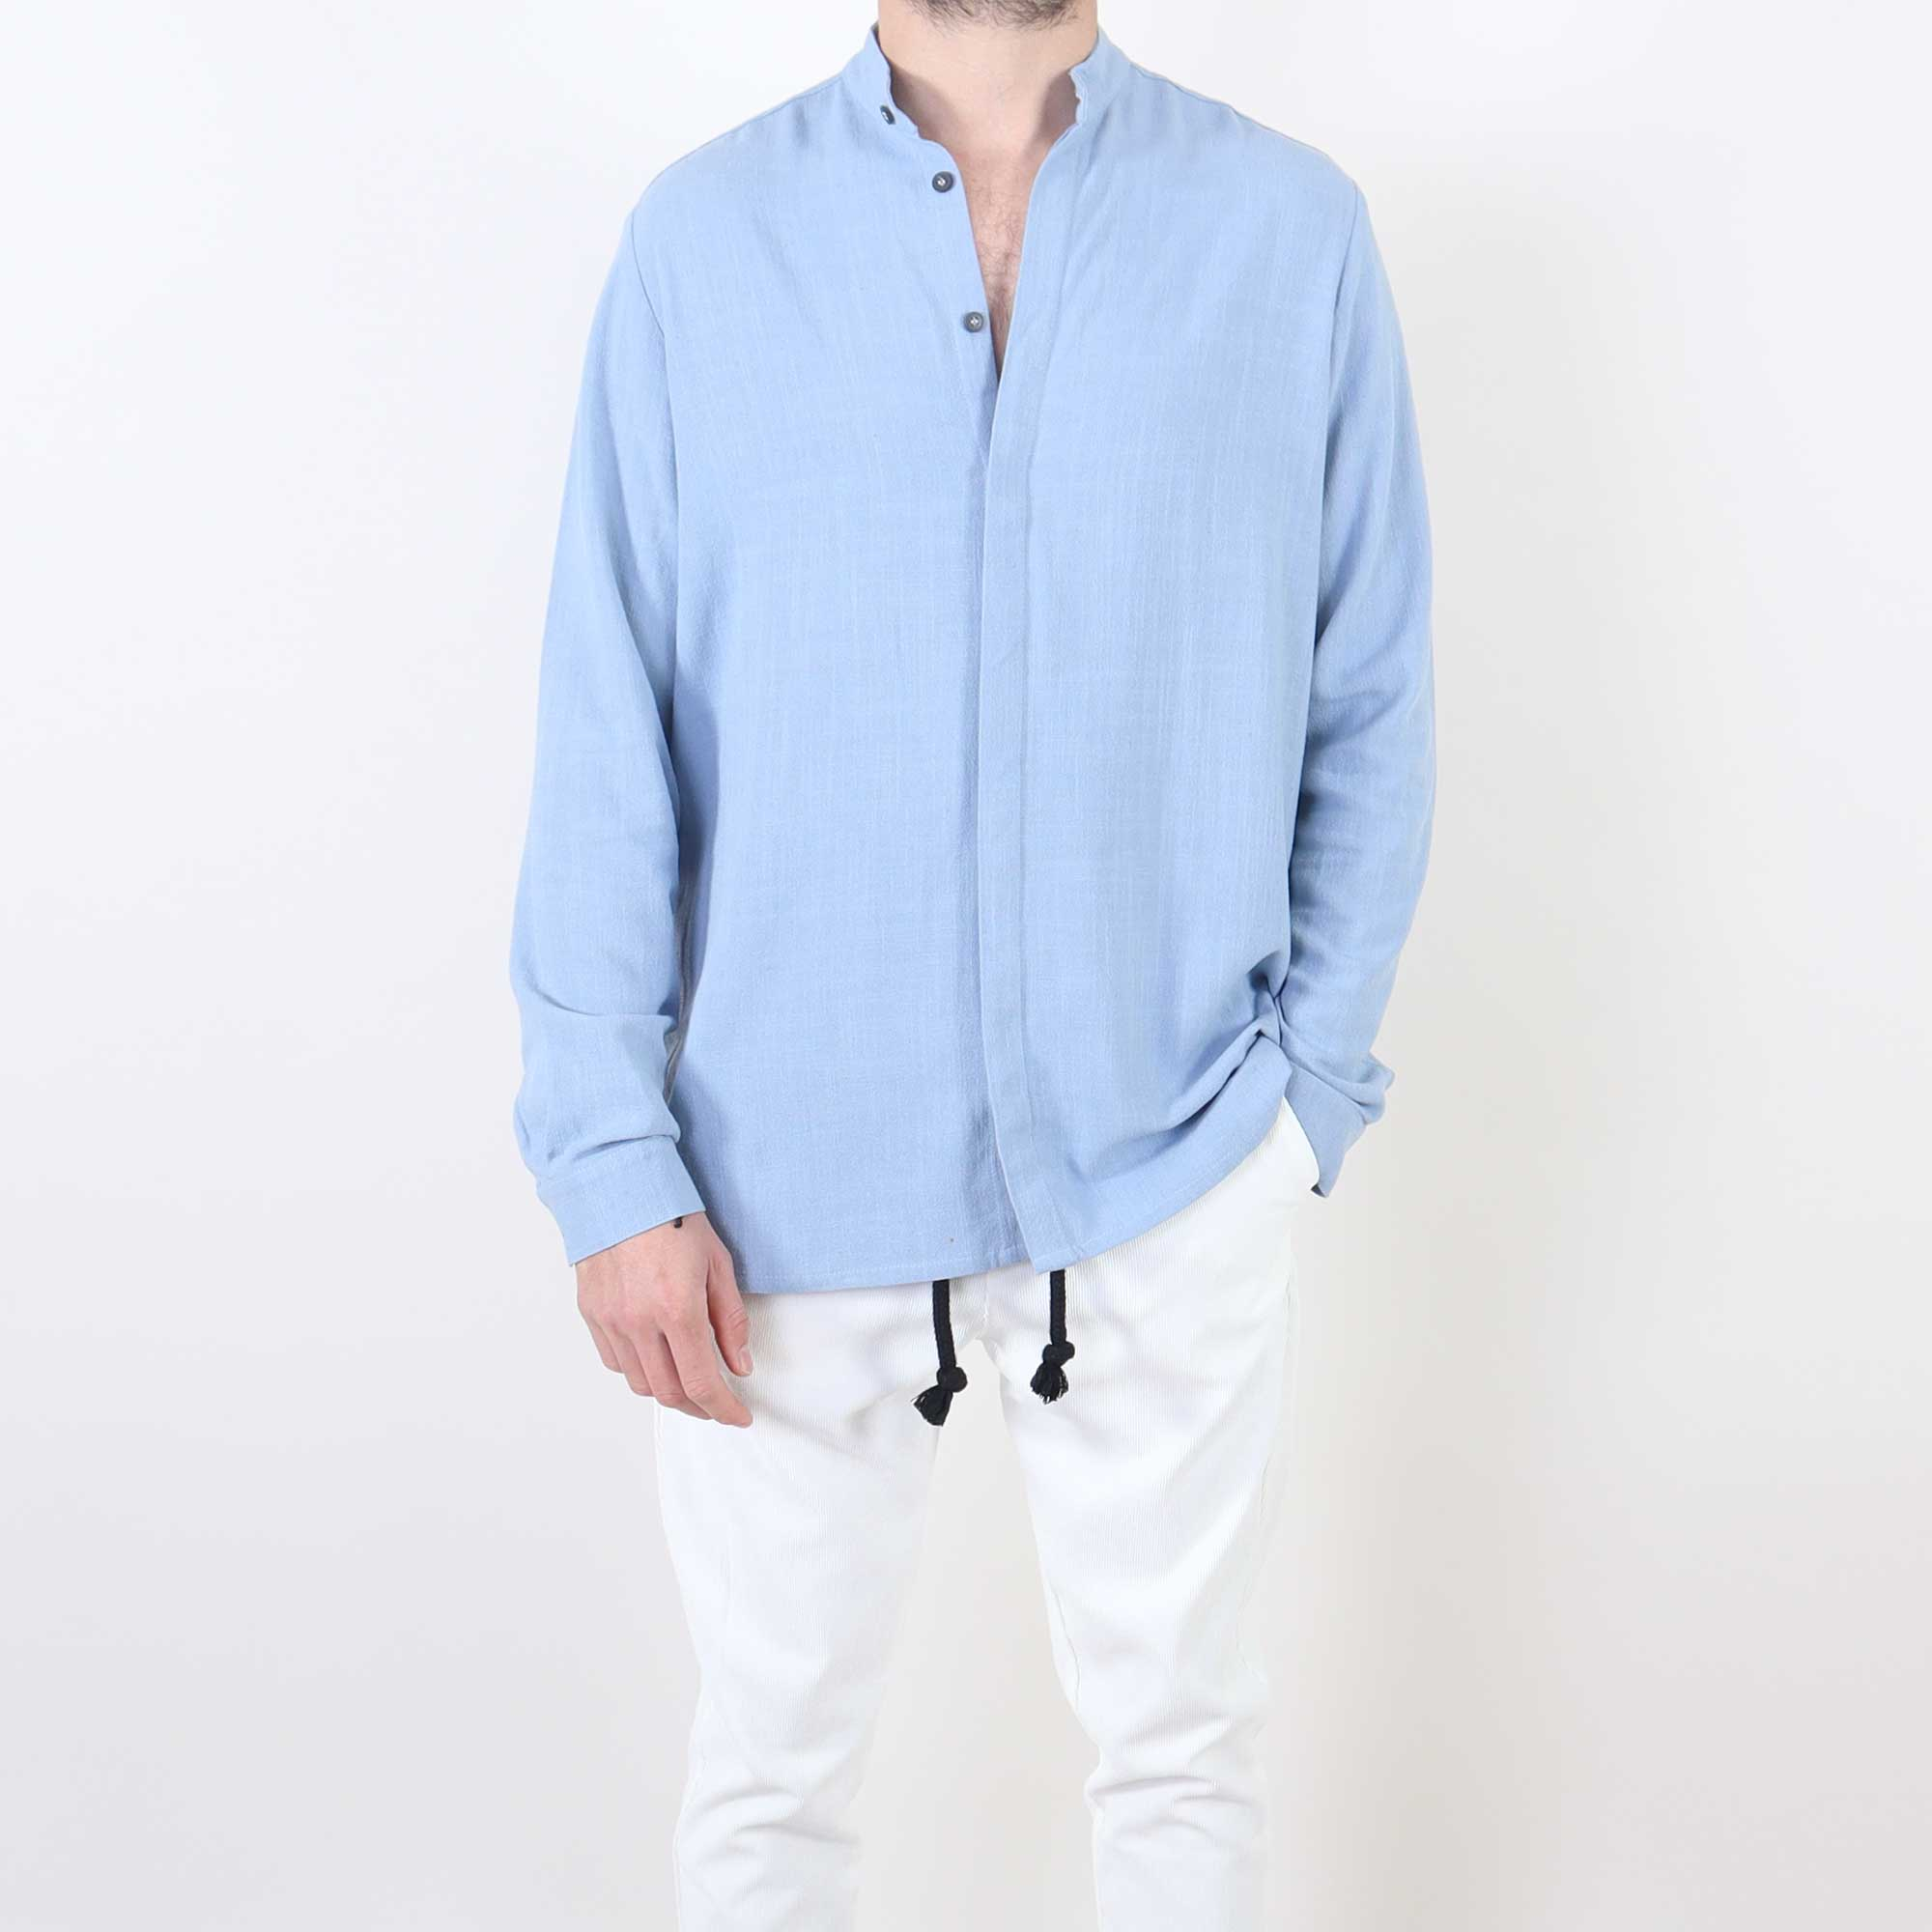 zippy-blauw-1